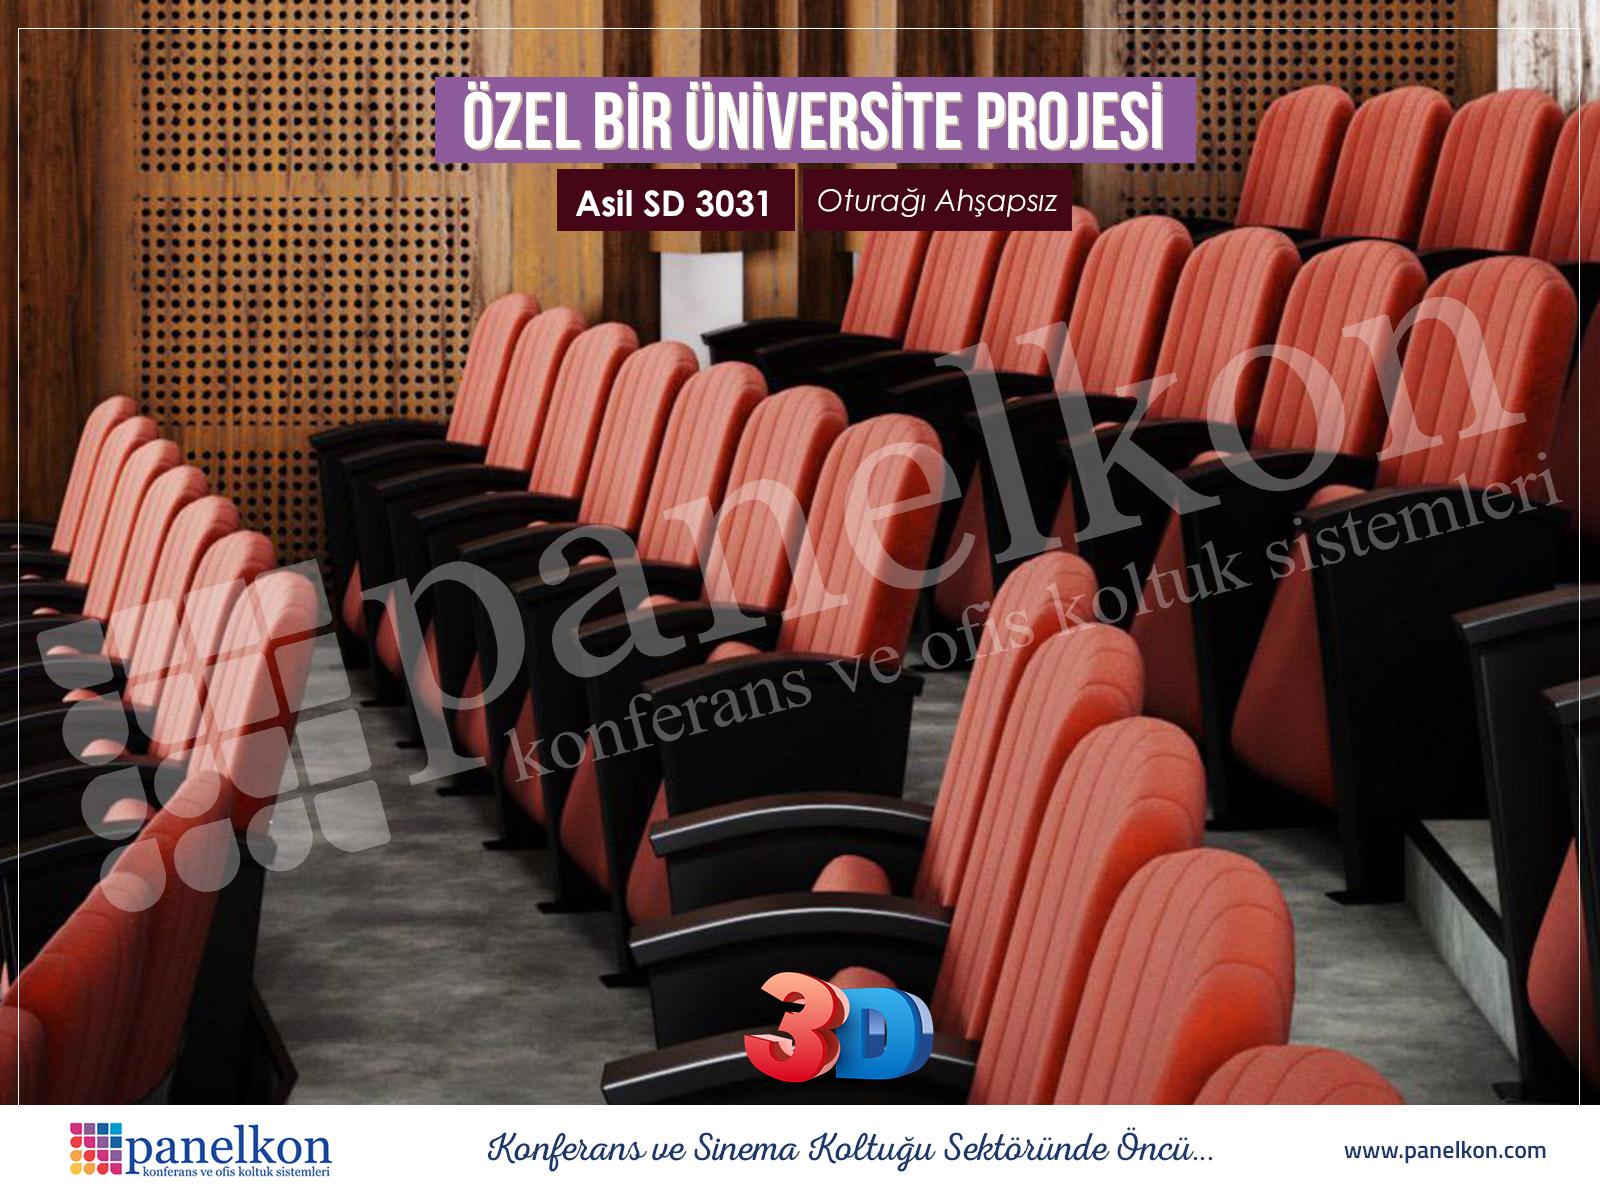 universite-konferans-koltugu-2